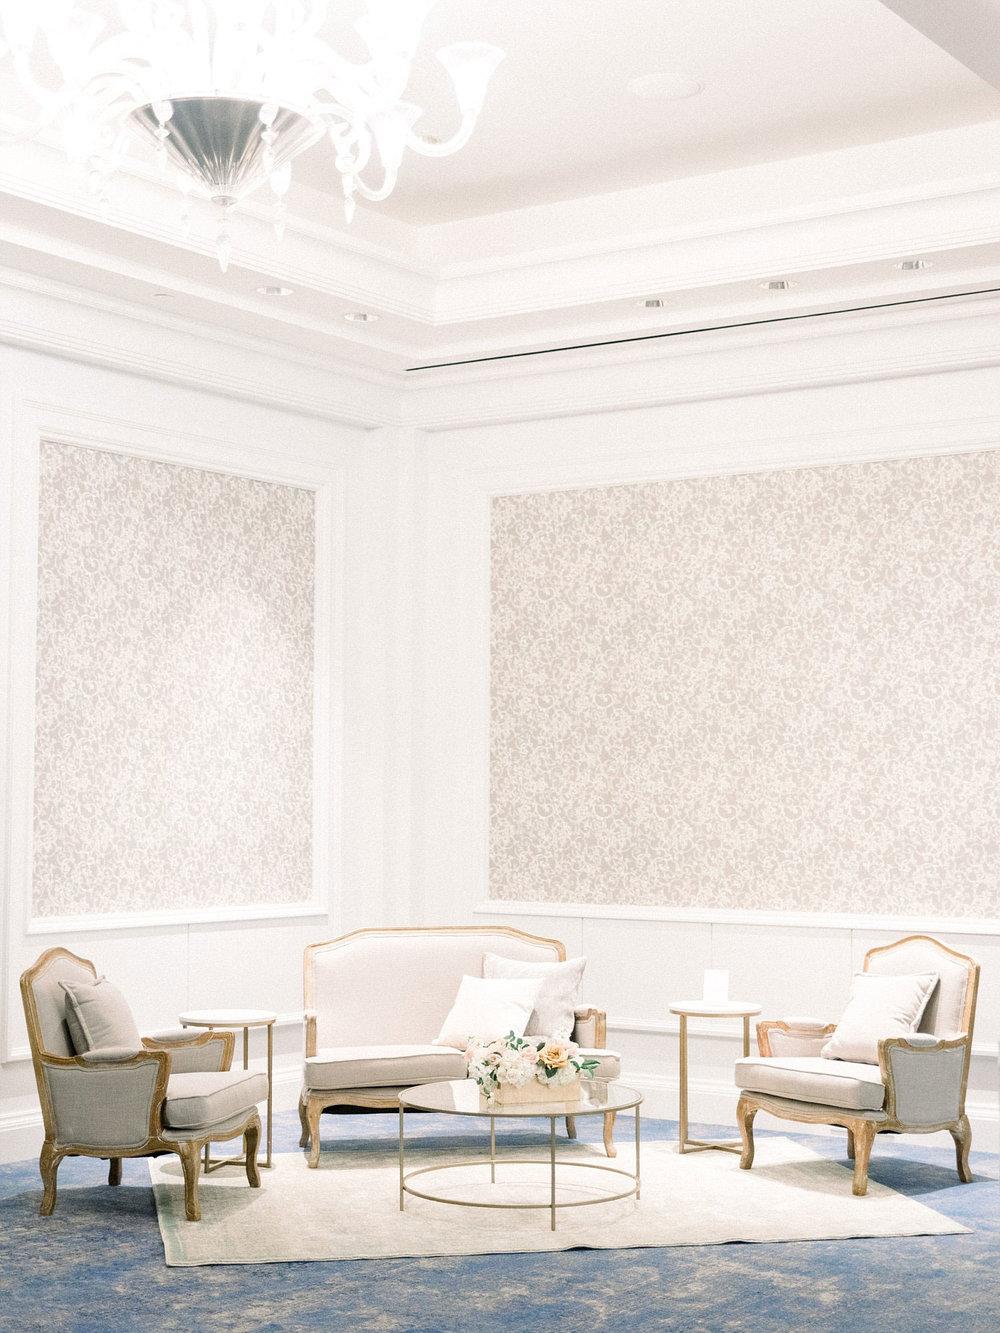 Lounge Set Up at the Ritz Carlton Dallas tX